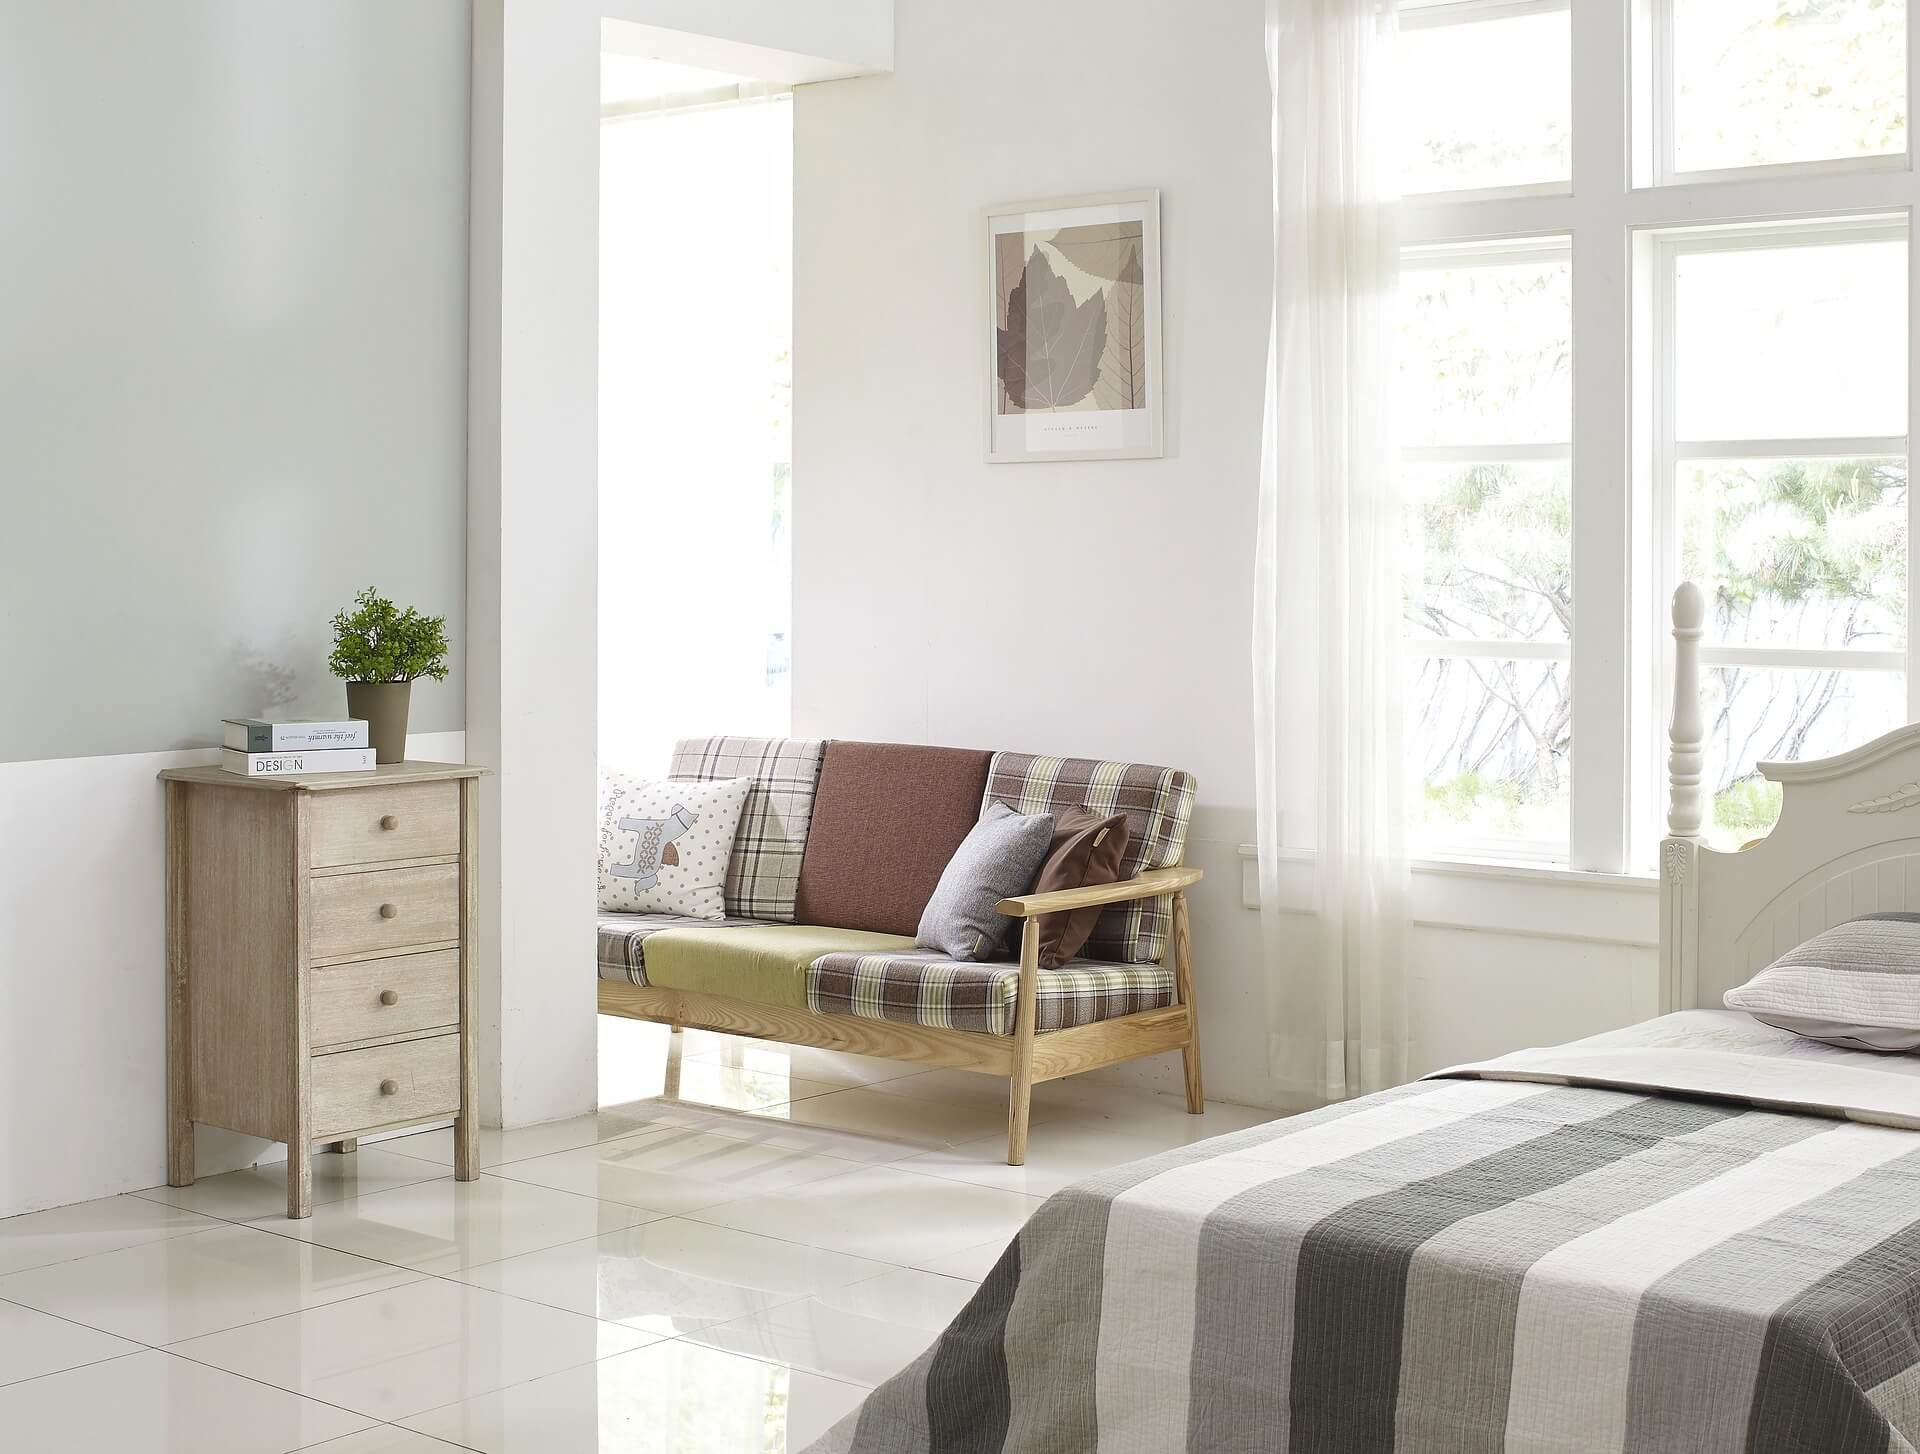 slaapkamer en allergie